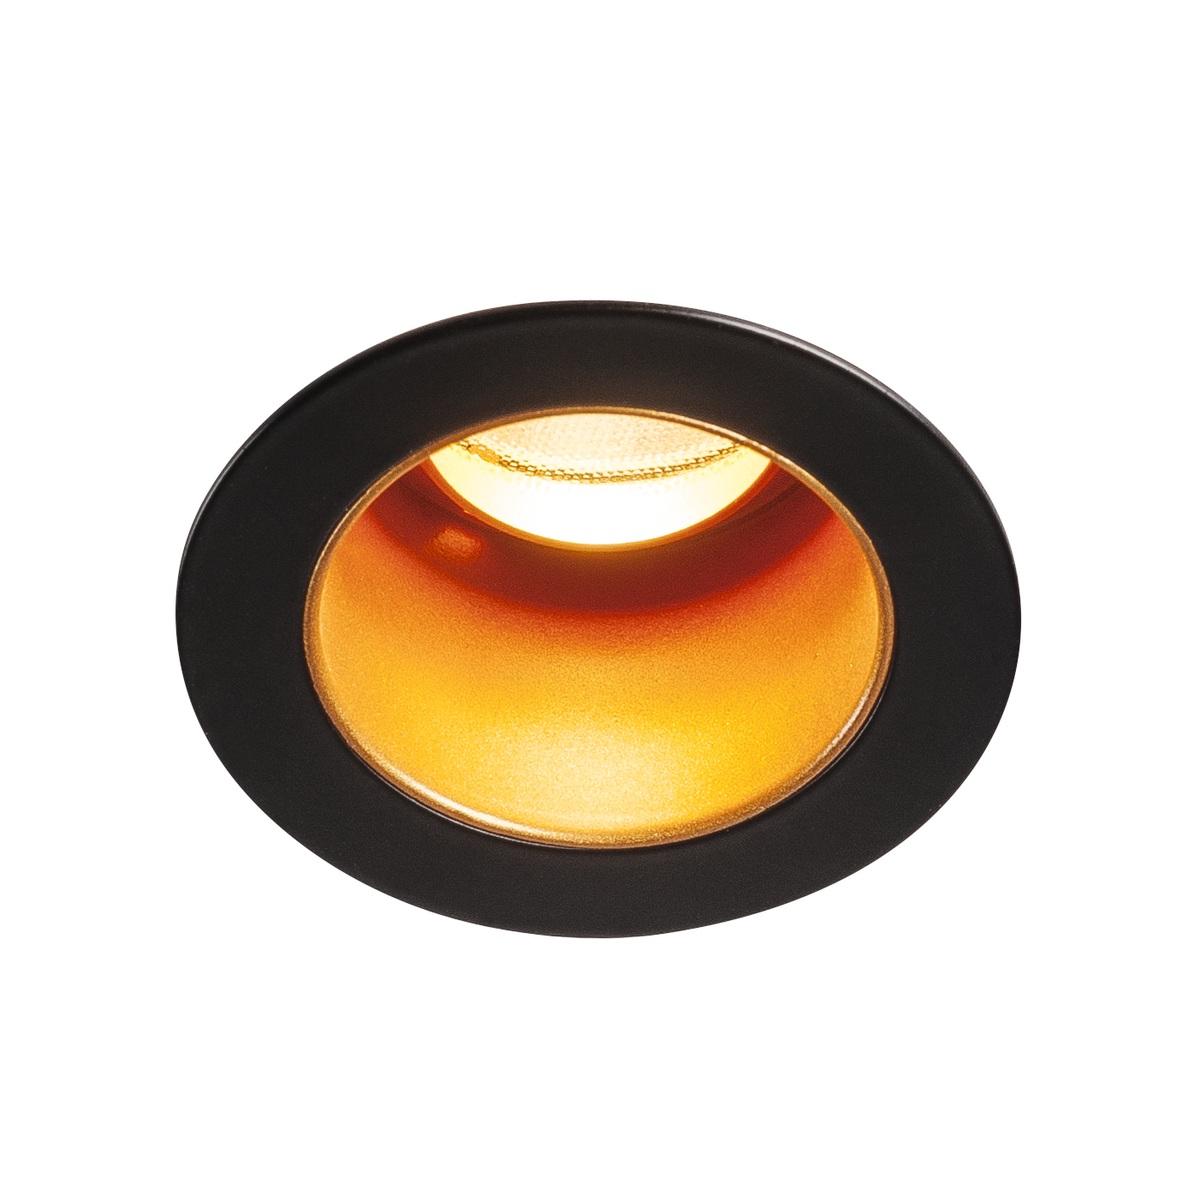 recessed light black gold led 3000kk 275lmlm o6cm h7 2cm slv